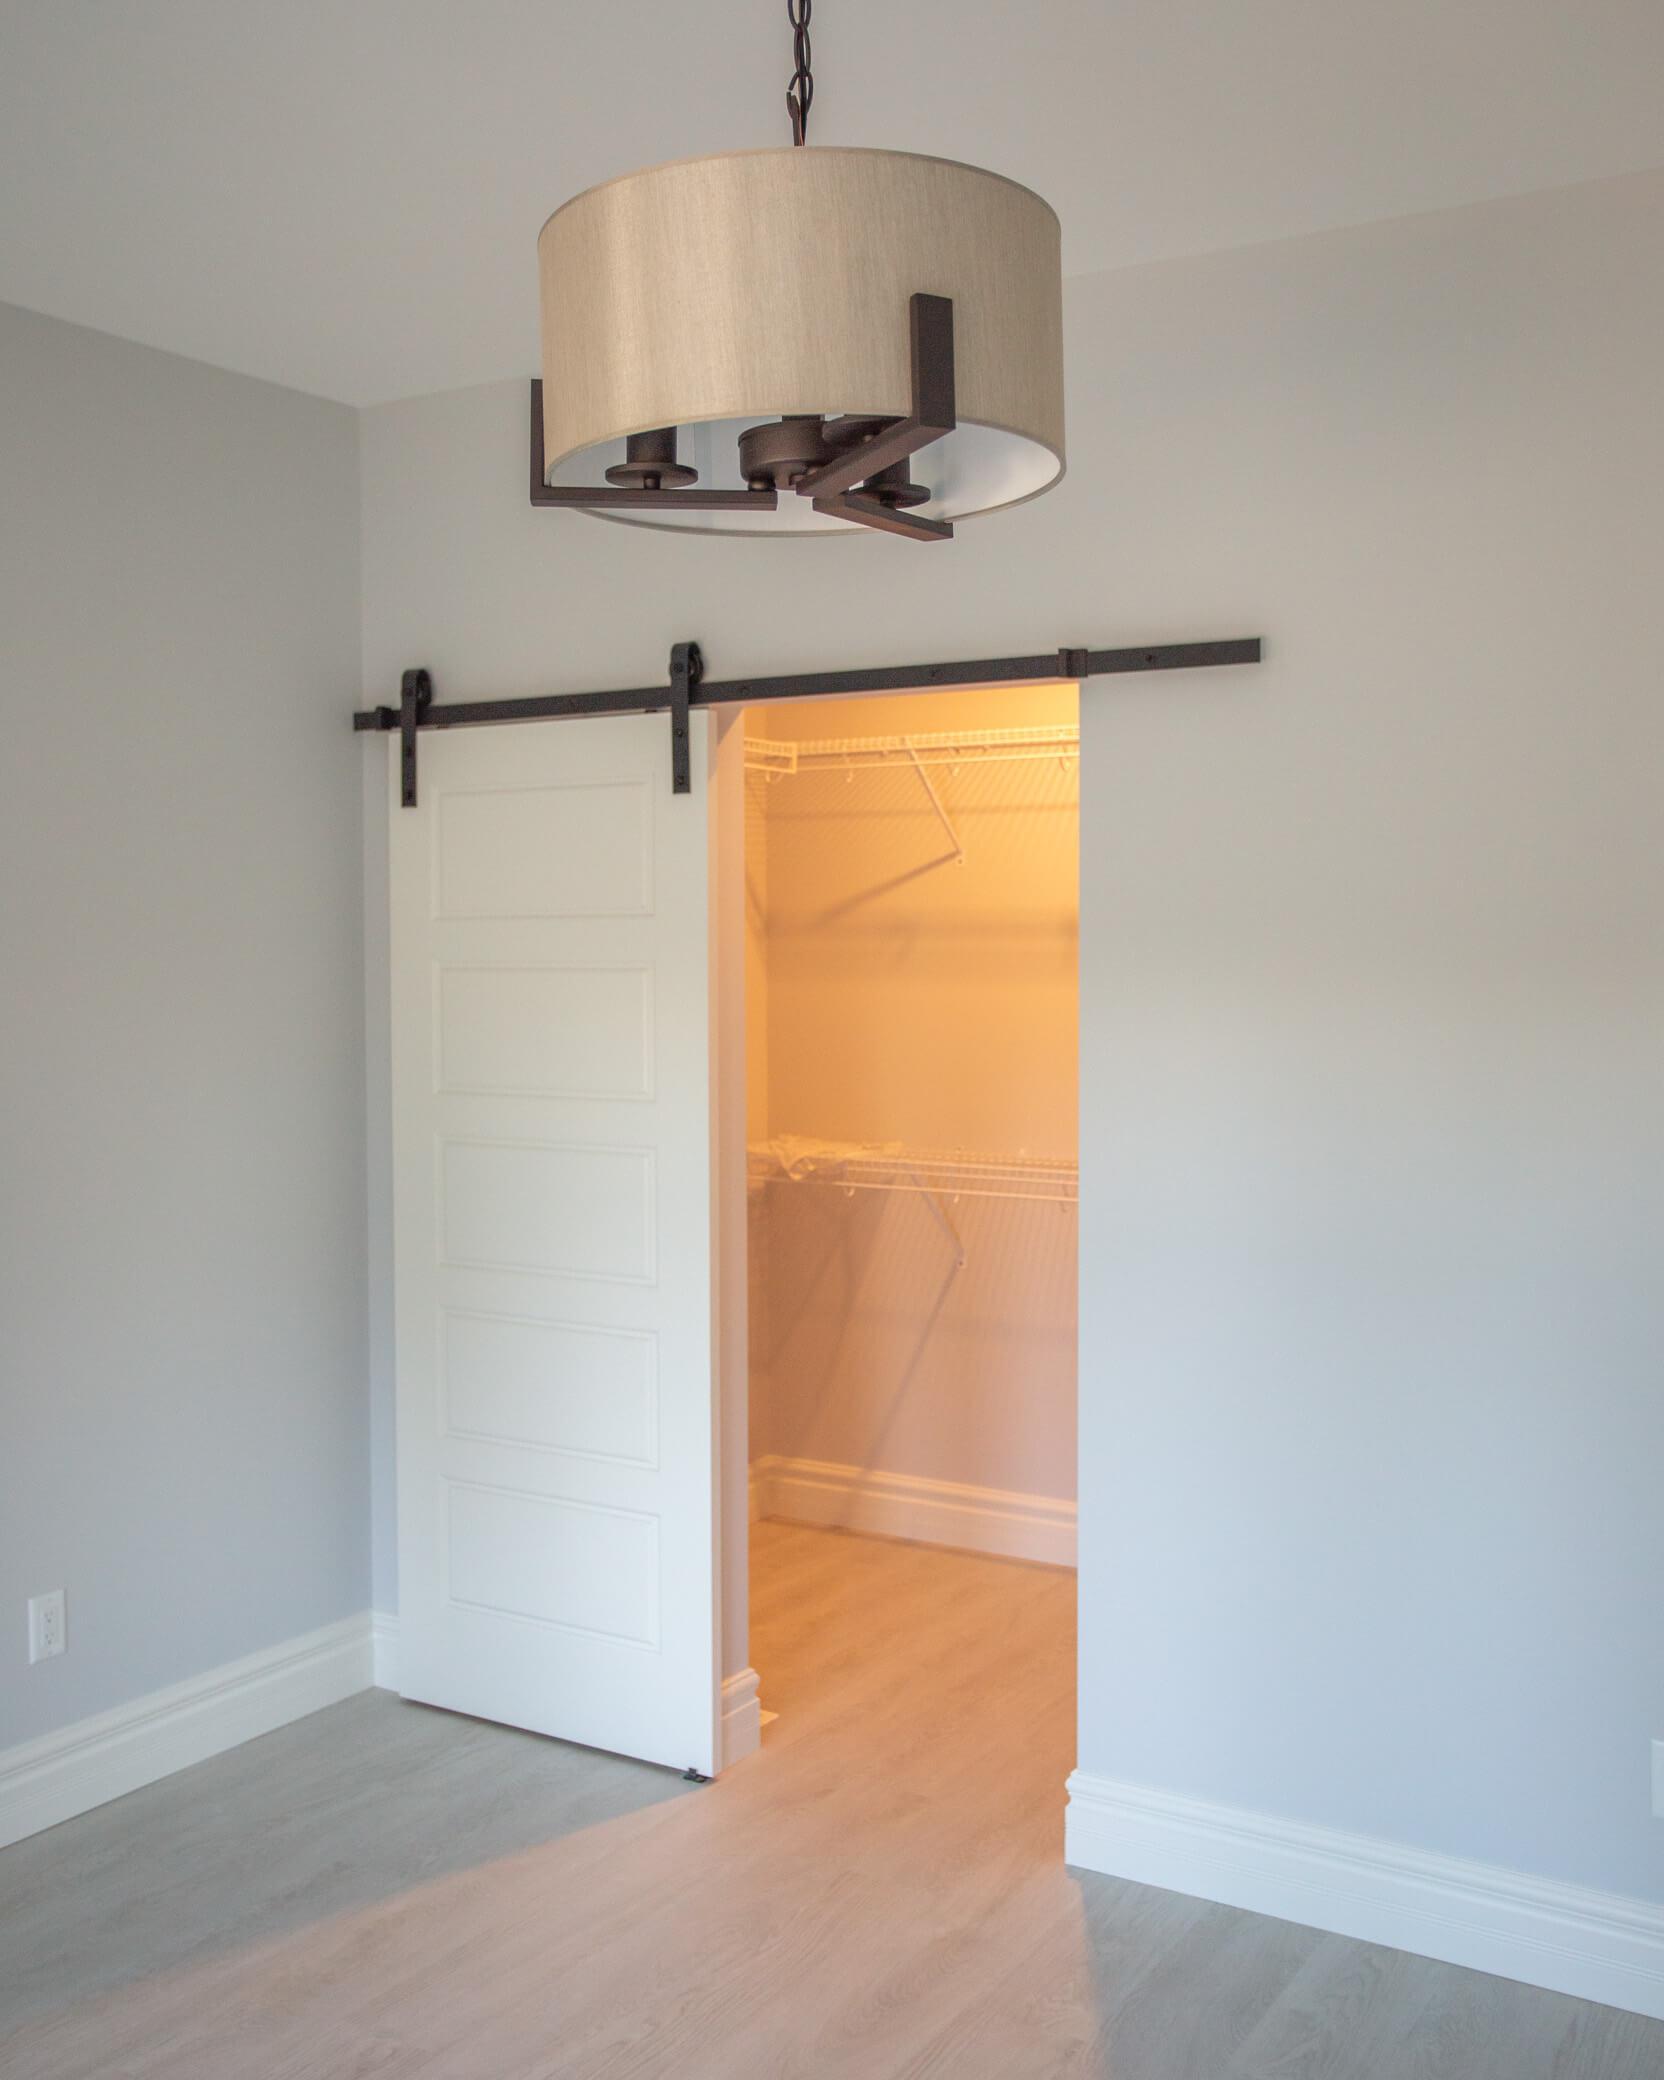 Renovated Addition in Lethbridge - Master Bedroom Closet